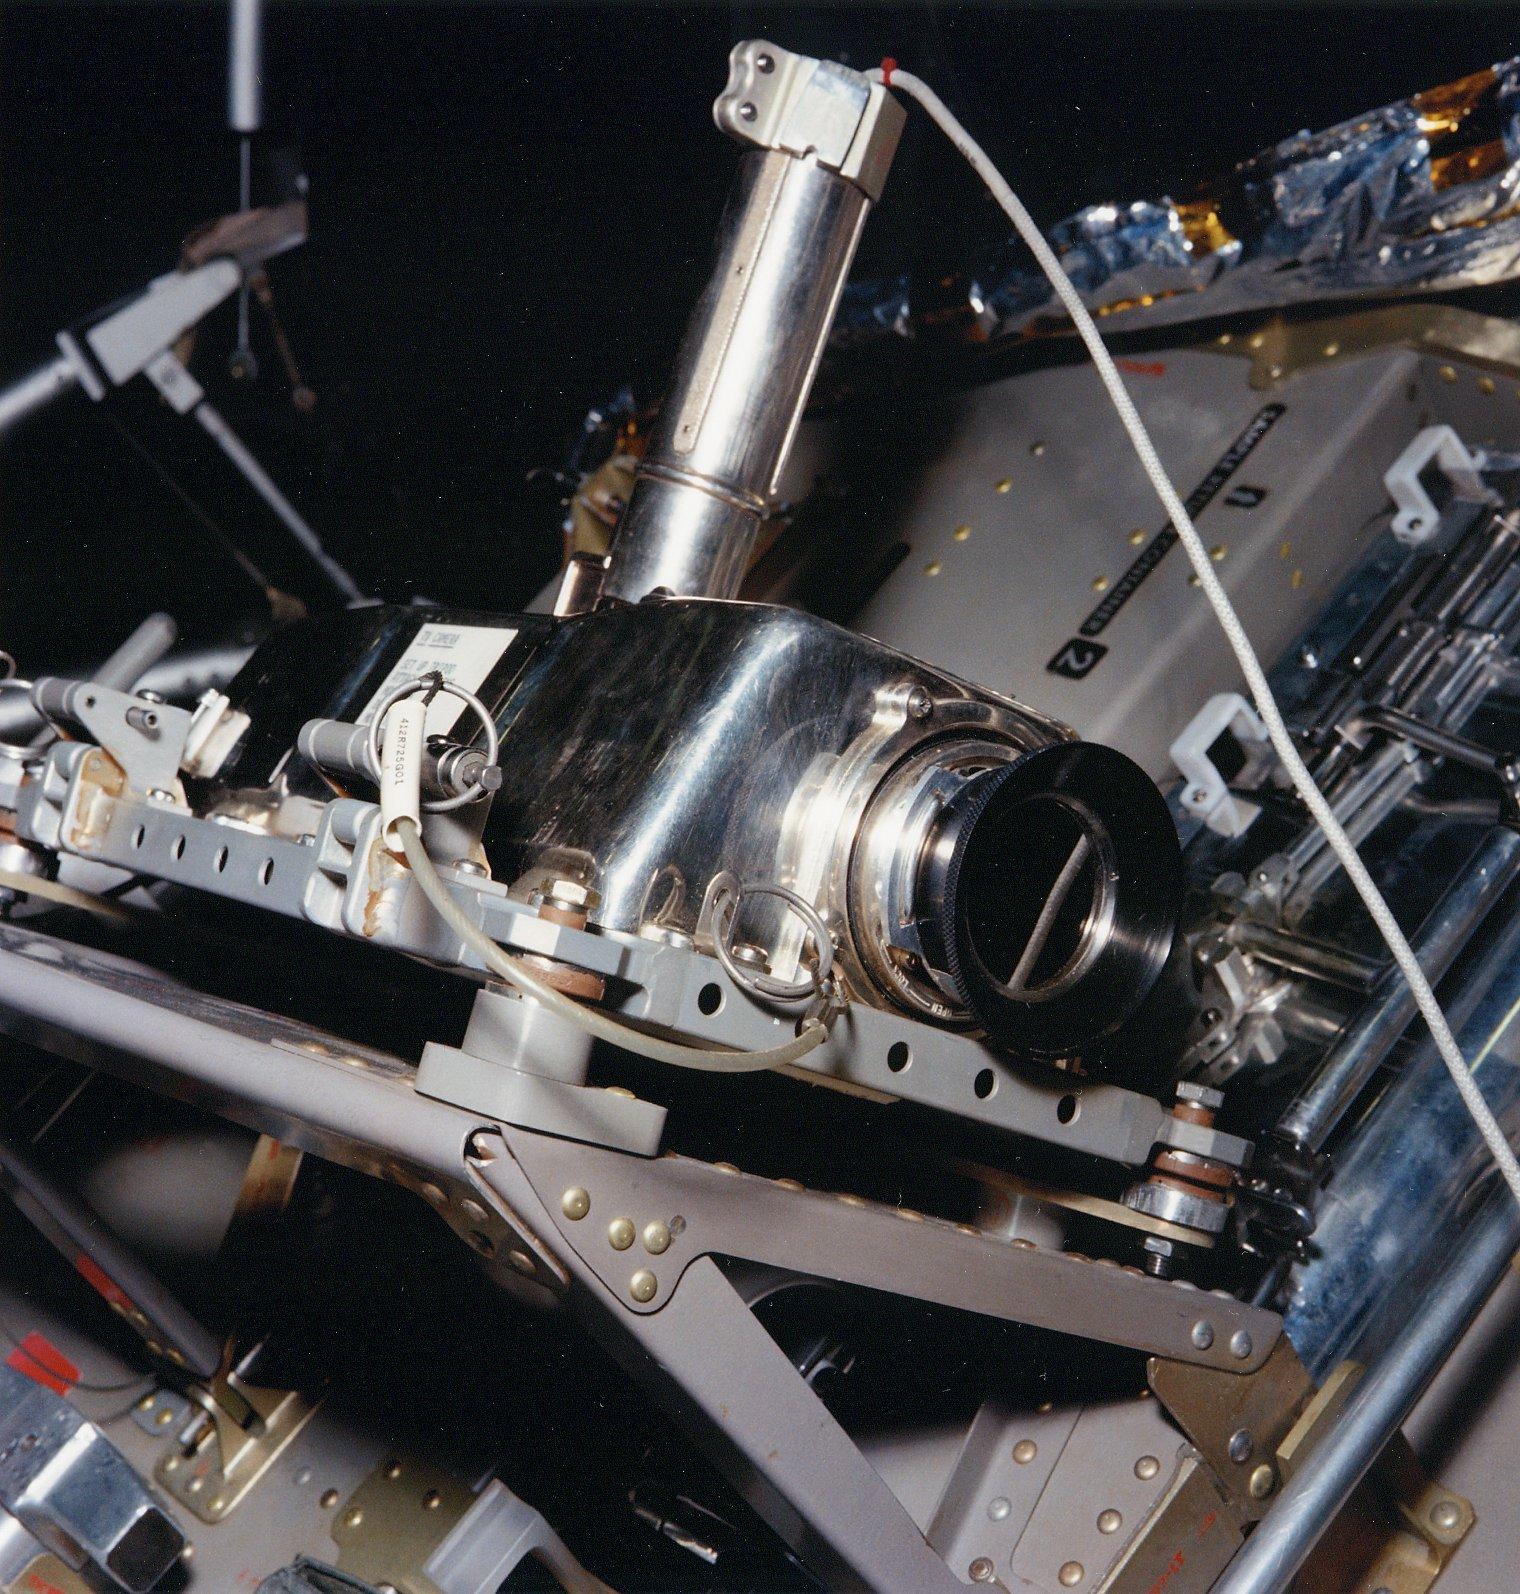 Apollo Lunar Television Camera była zainstalowana na module Apollo 11